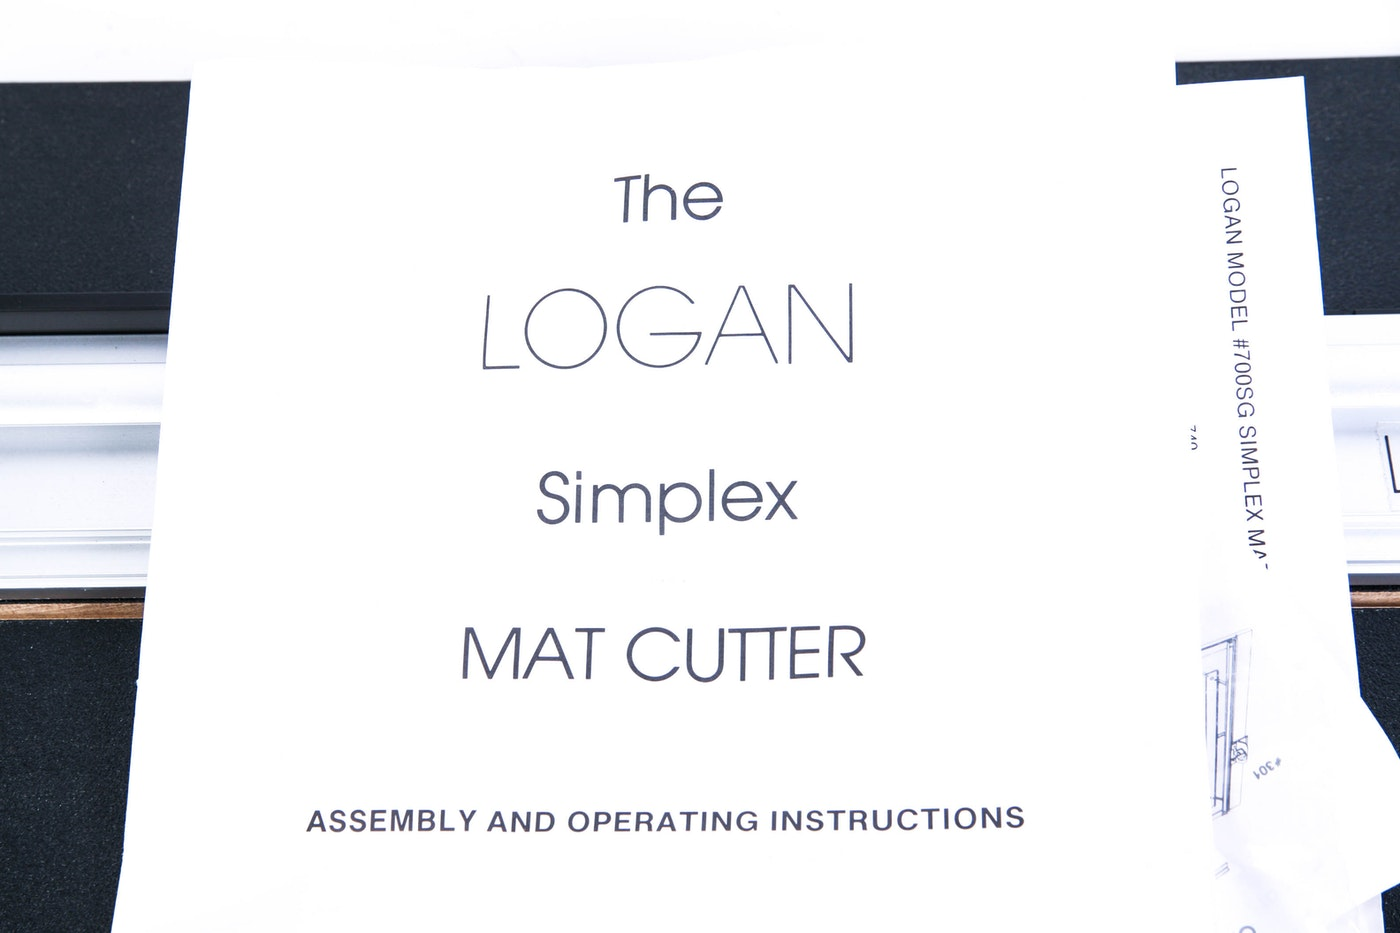 Logan Simplex Graphic Professional Mat Cutter Ebth